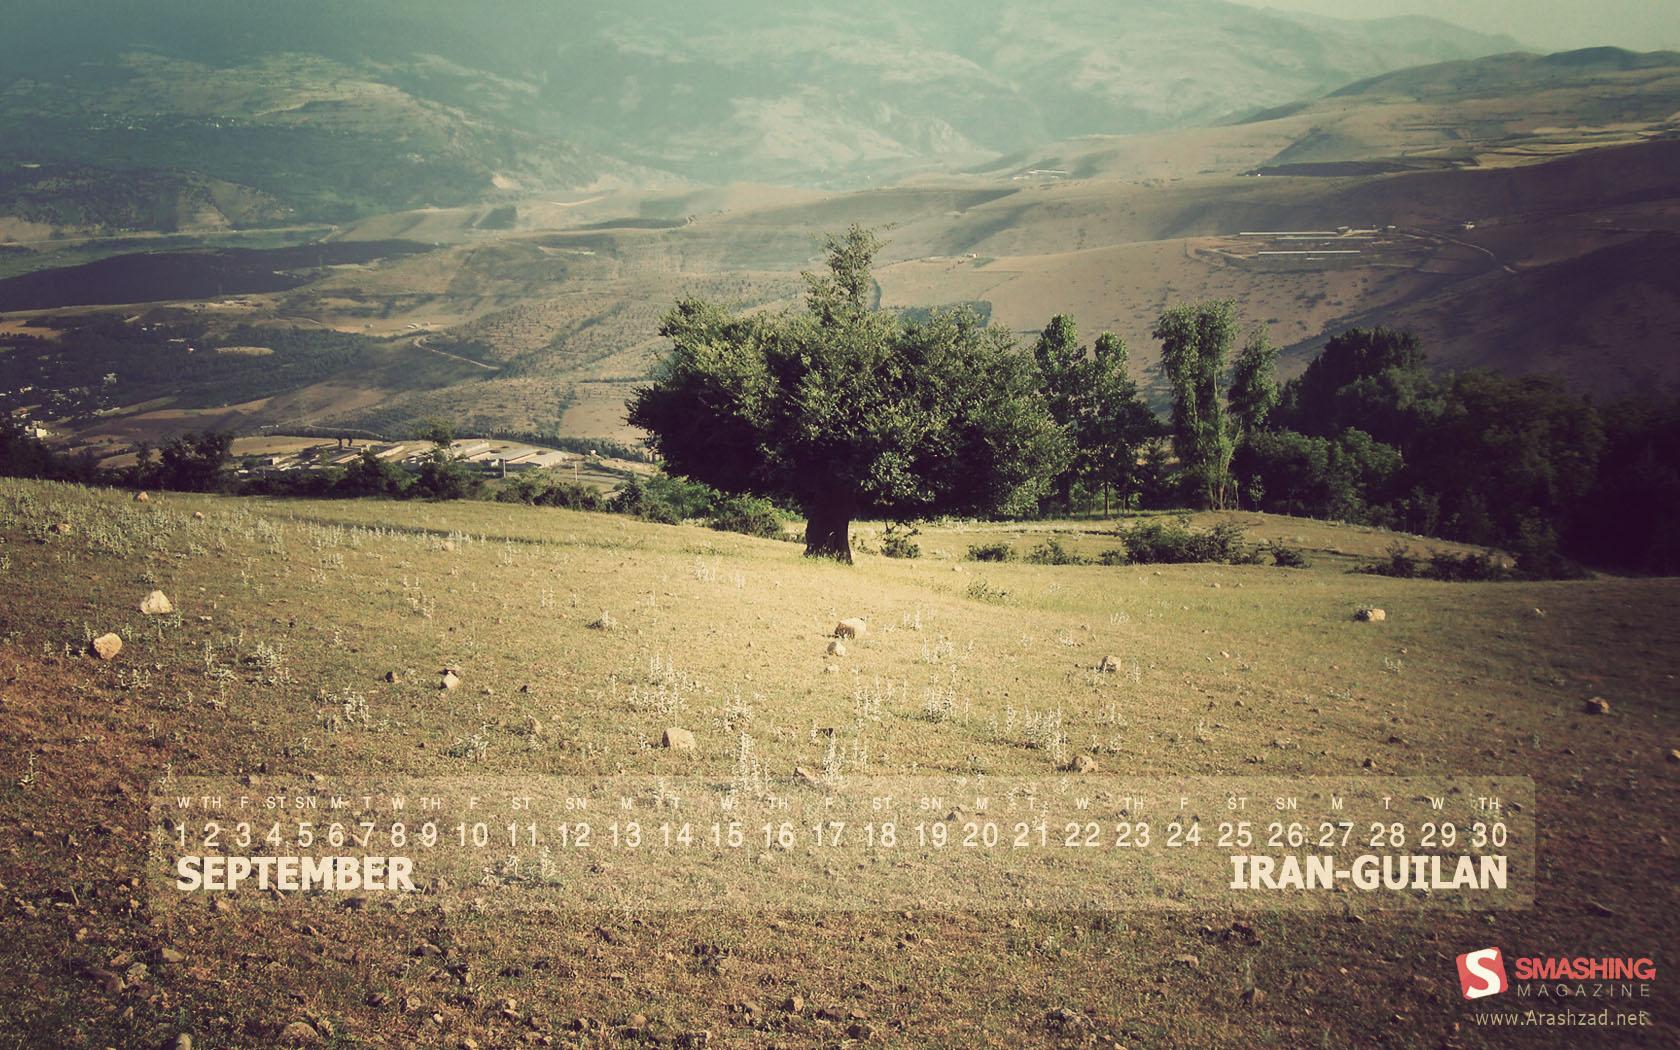 Iran-guilan in Desktop Wallpaper Calendar: September 2010